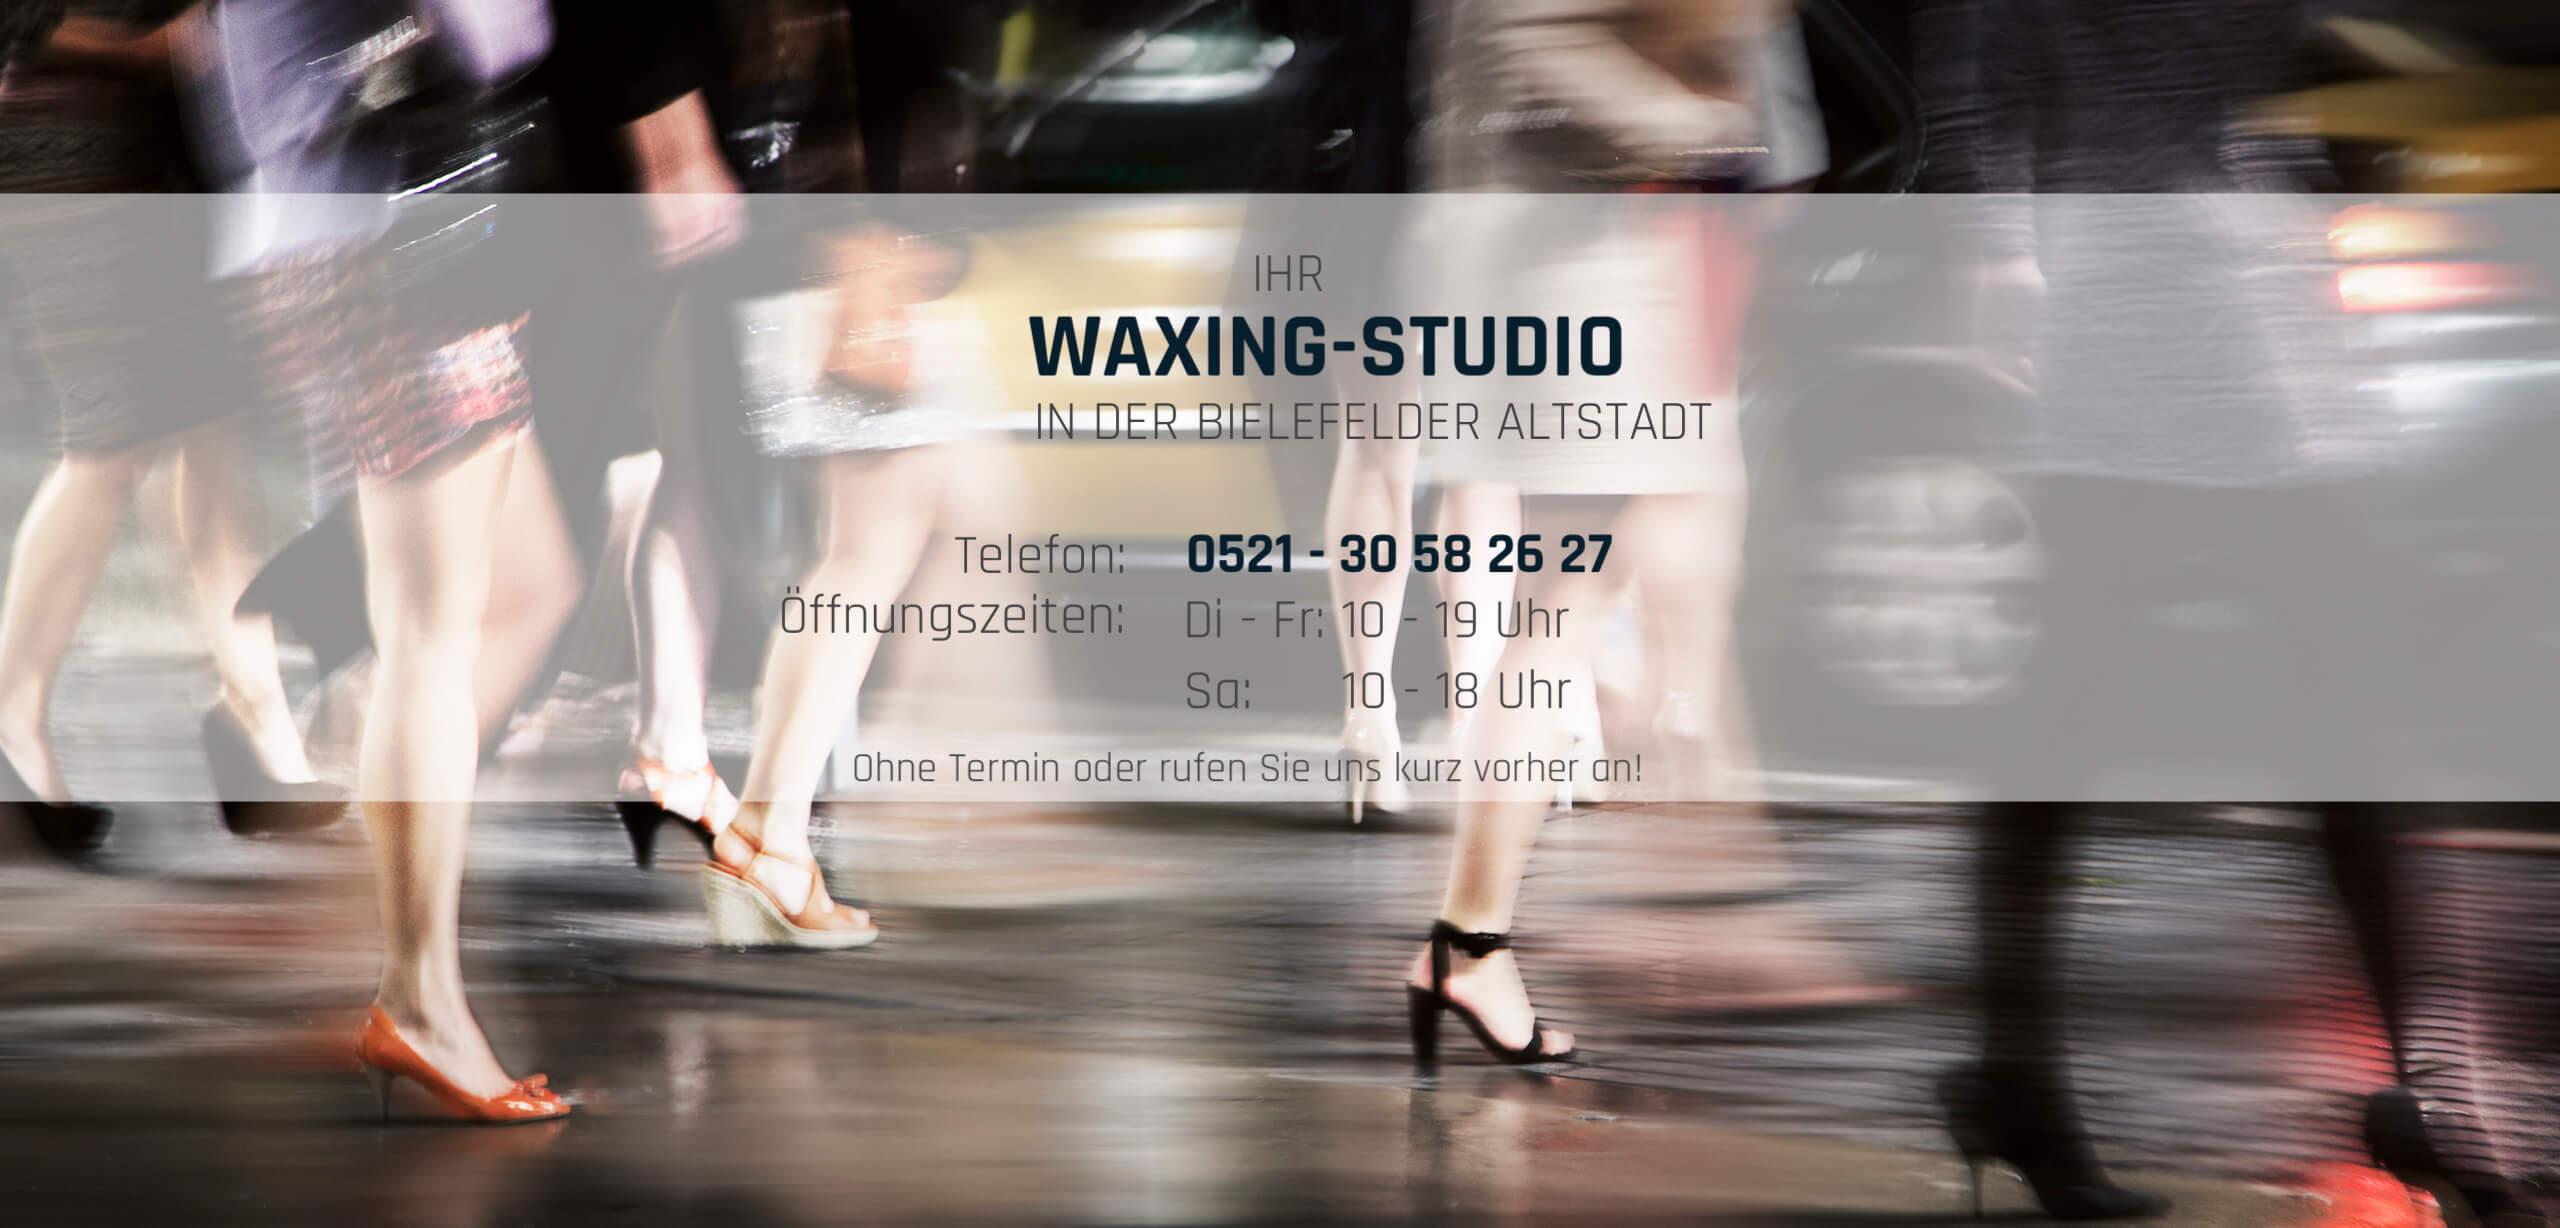 Hin und Wax - Ihr Waxing-Studio in Bielefeld: Waxing und Haarentfernung